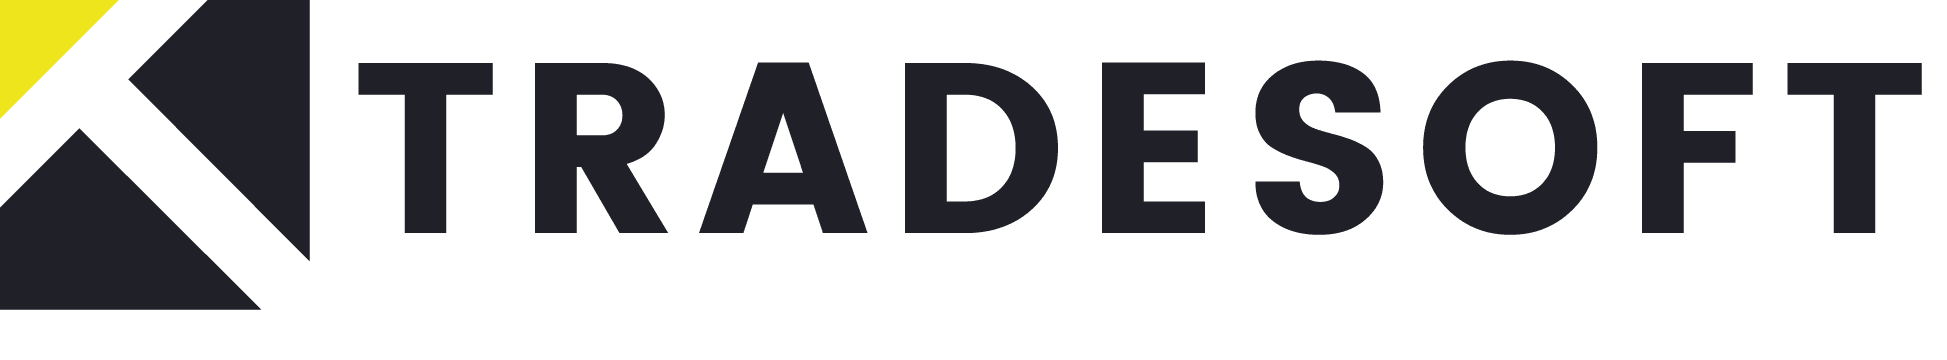 Tradesoft Logo